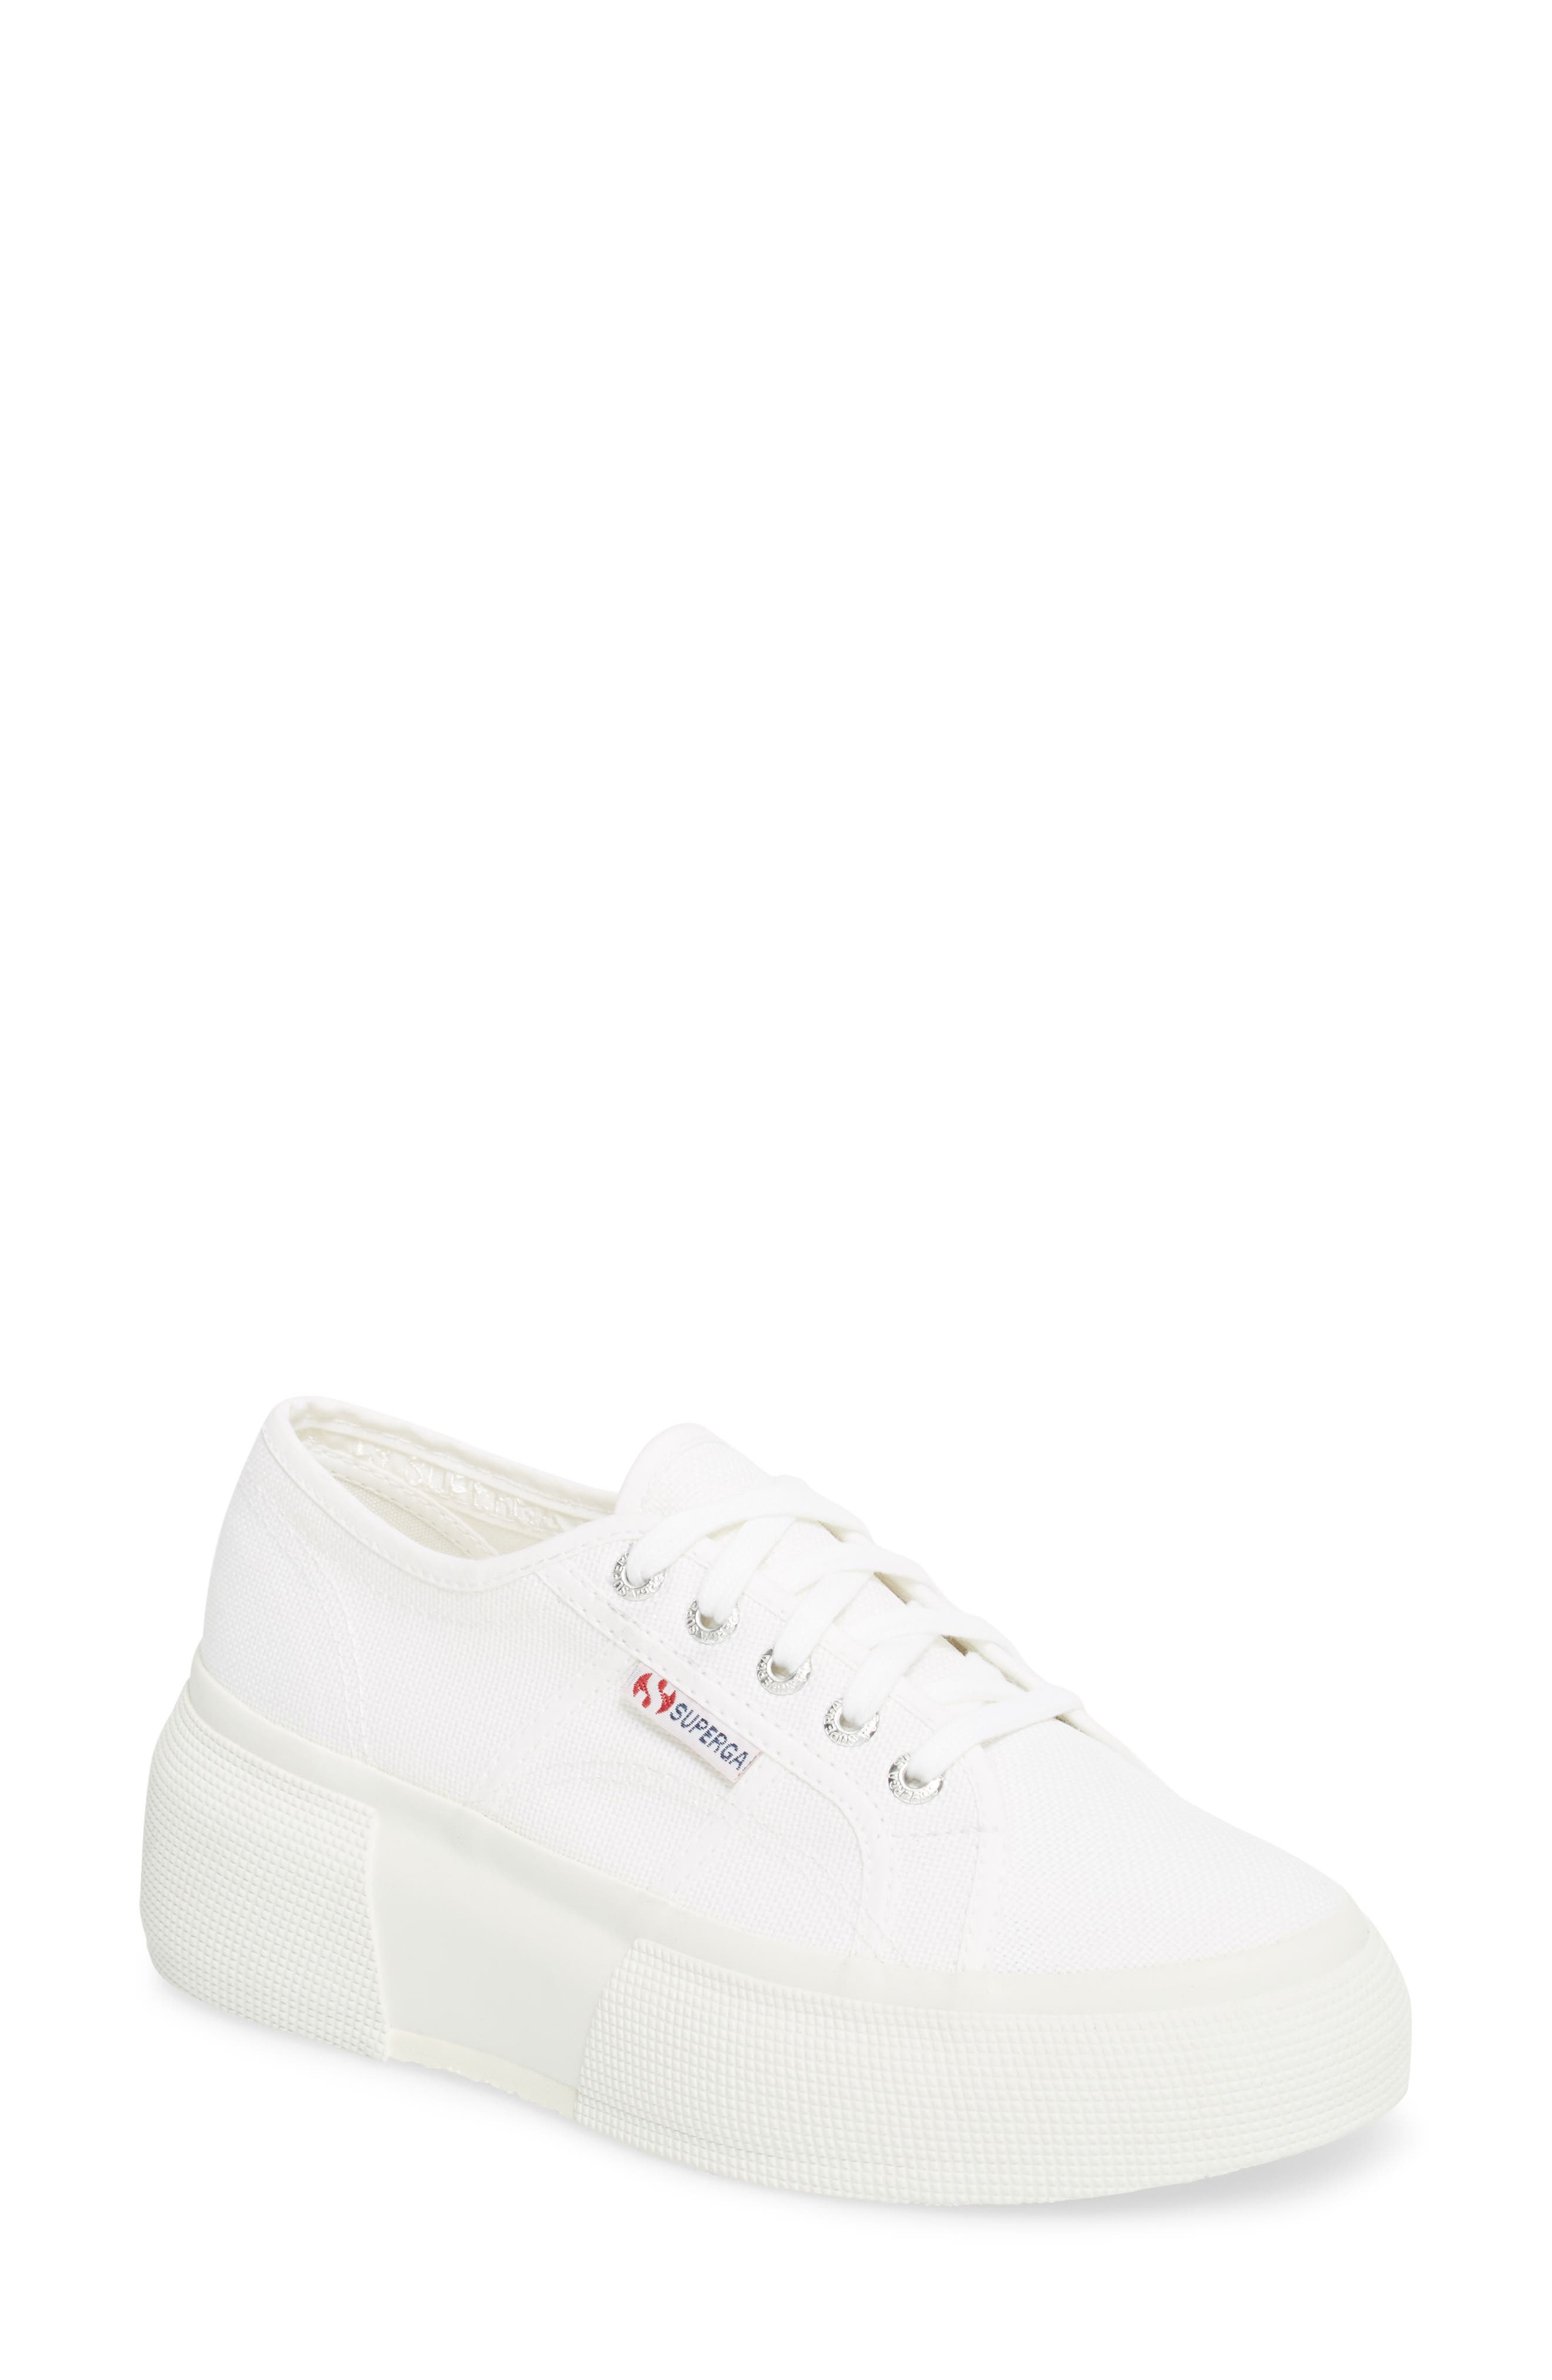 2287 Cotu Platform Sneaker,                             Main thumbnail 1, color,                             White